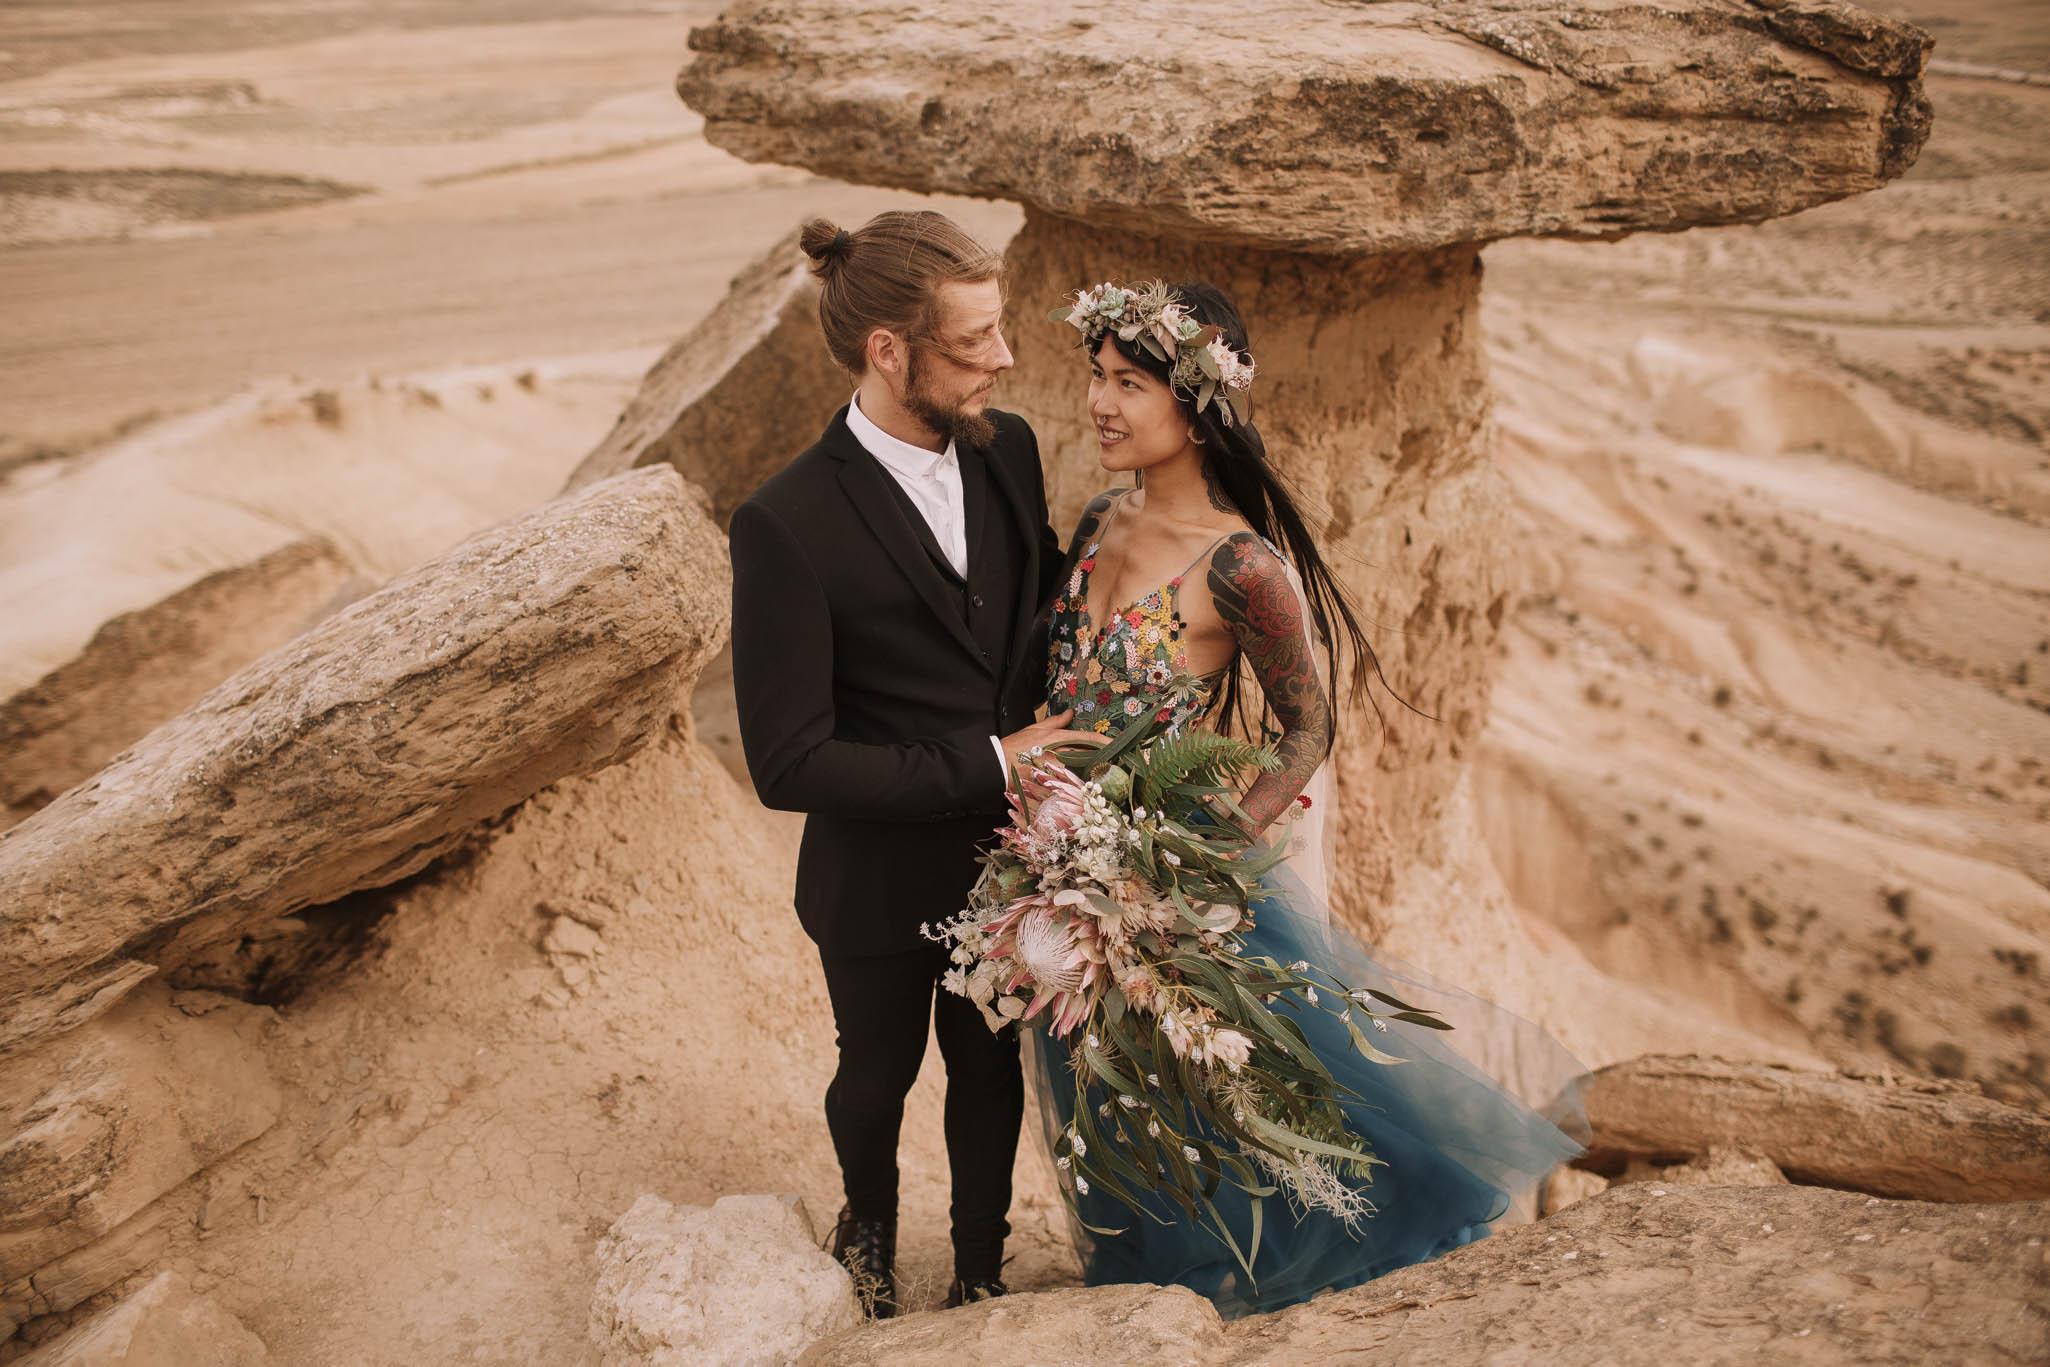 Spain-wedding-photographer-bardenas-reales-jeremy-boyer-photographe-mariage-bordeaux-floral-wedding-dress-robe-123.jpg